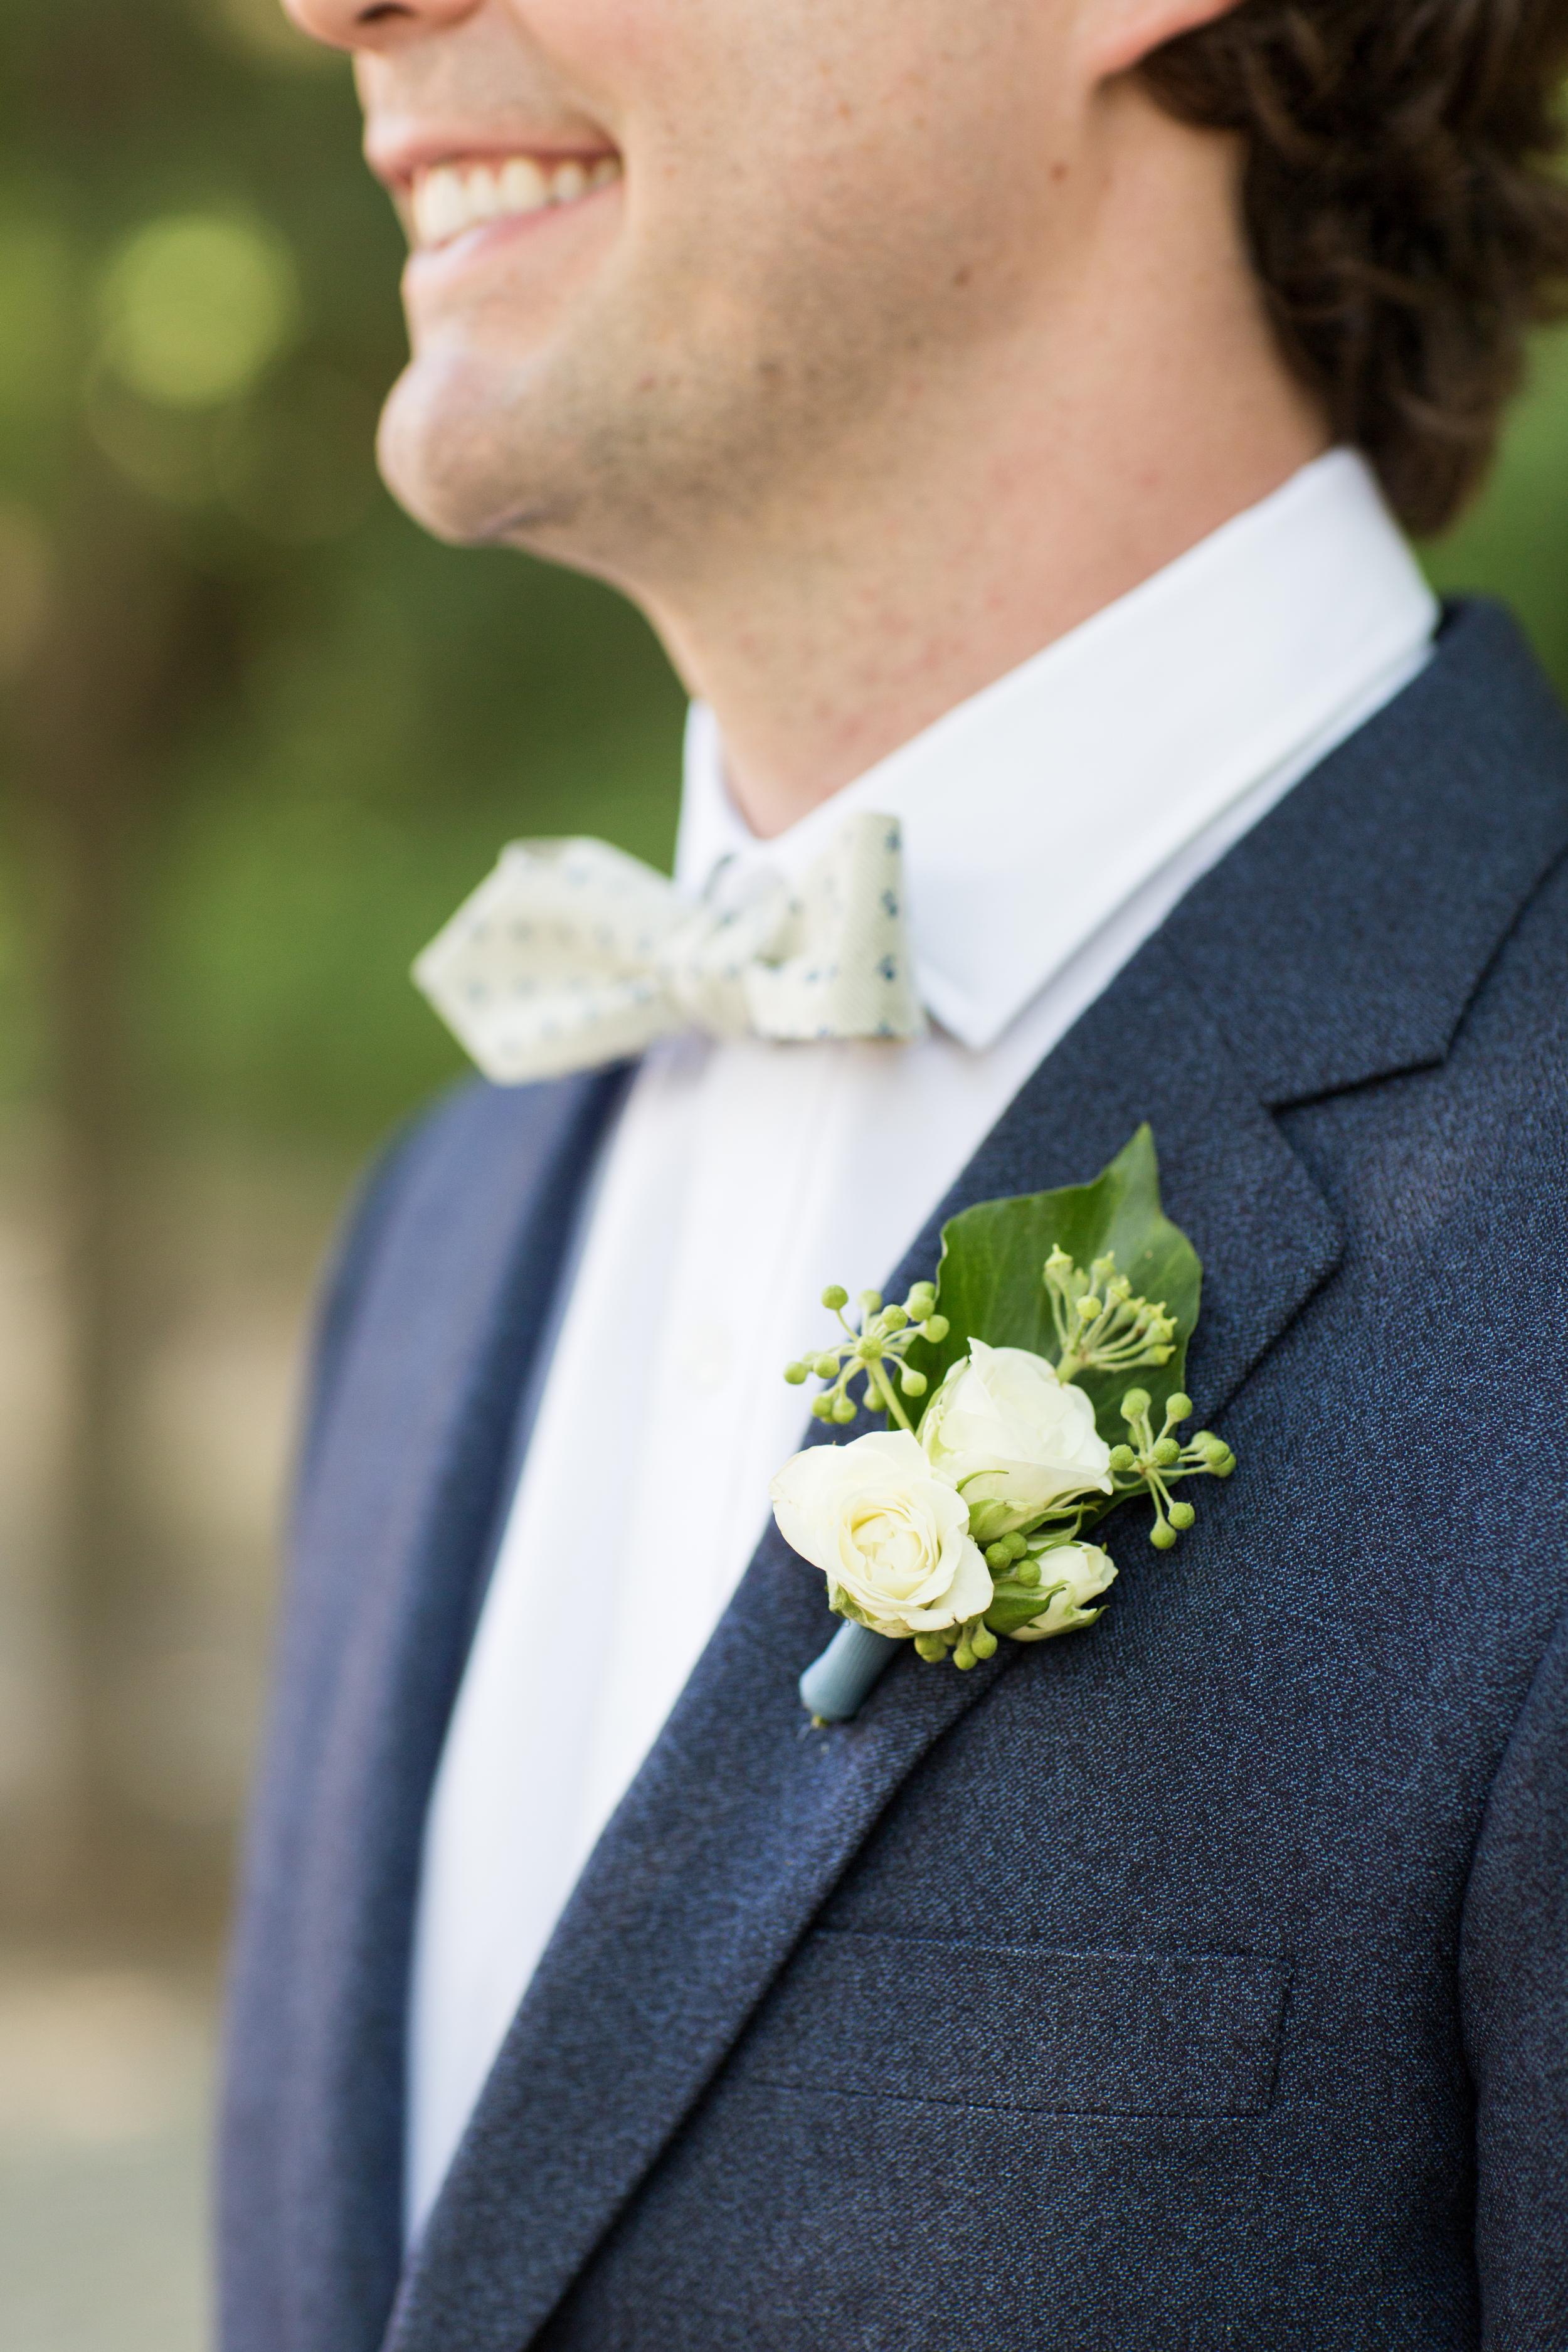 hannah_shih_hanaluluco_cj_isaac_charlie_juliet_ombre_chambray_prospect_park_brooklyn_wedding_7.jpg